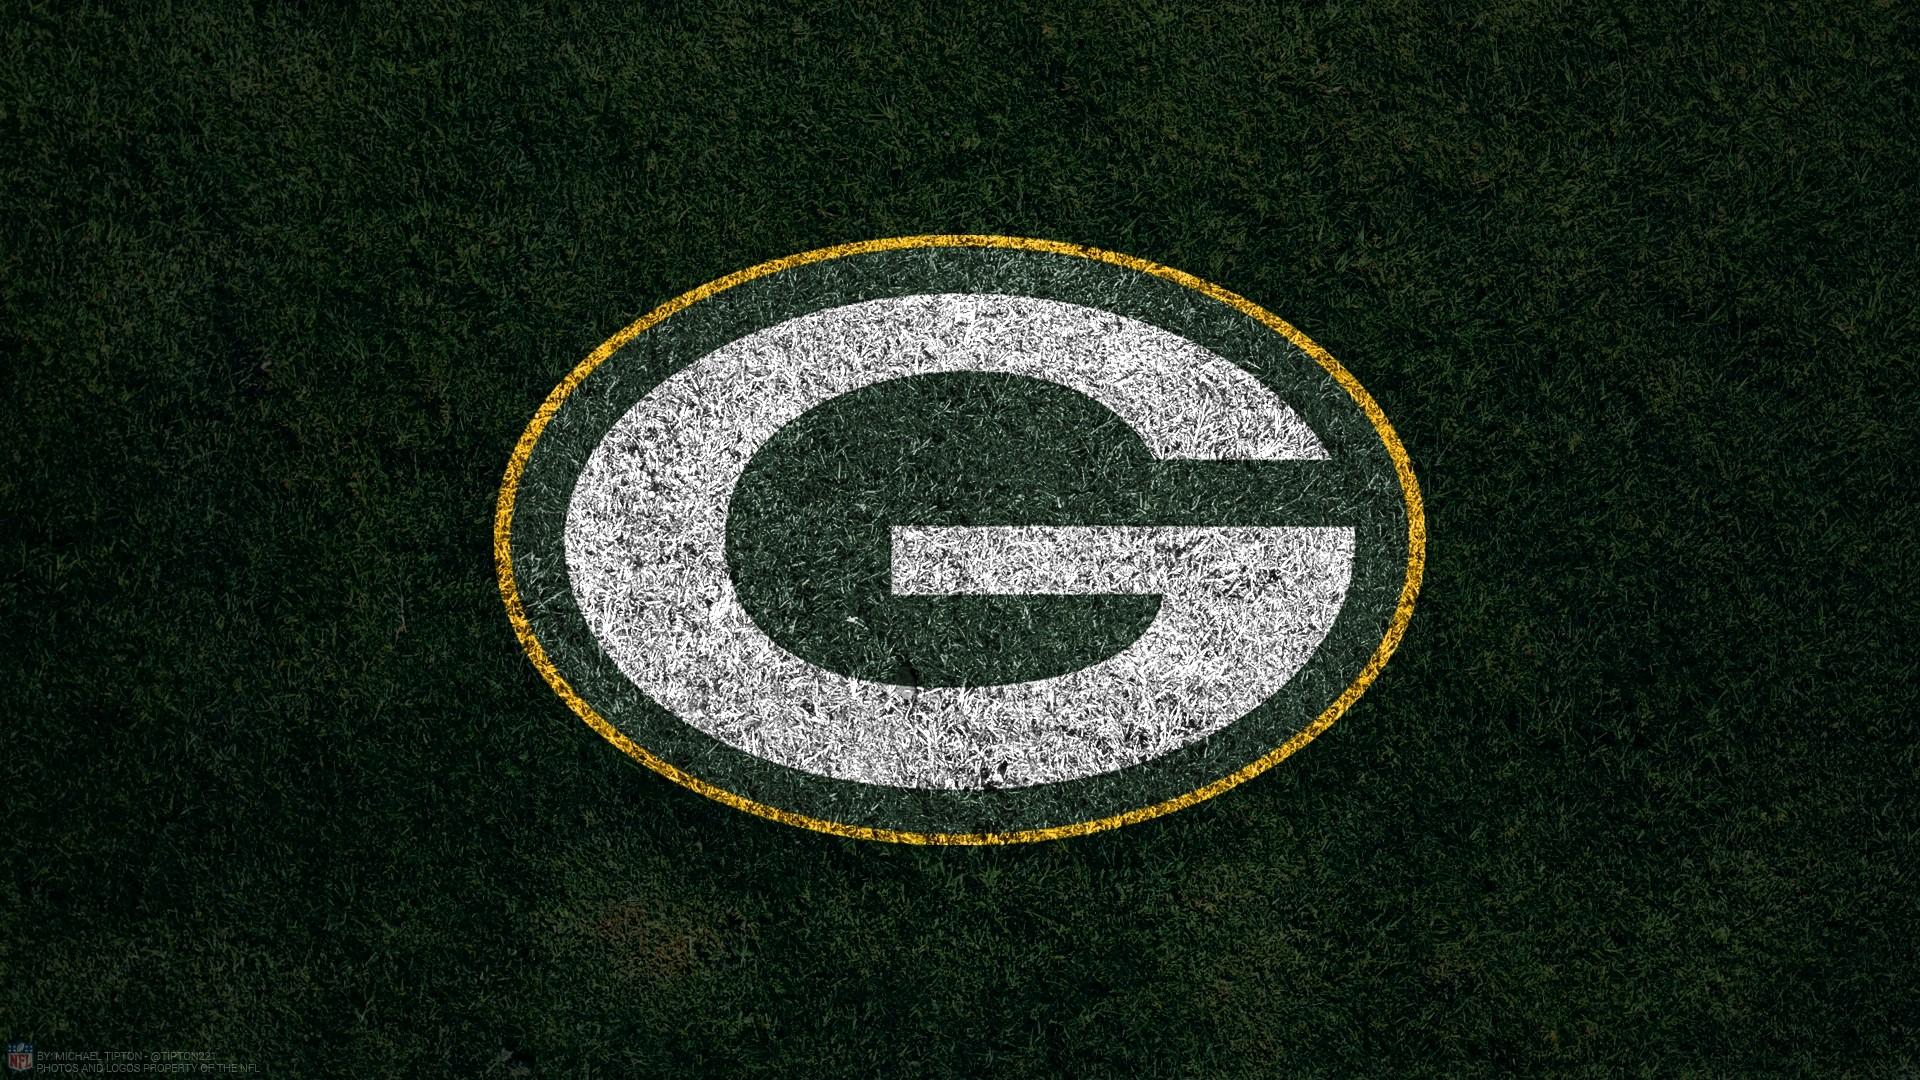 Green Bay Packers wallpaper photo hd